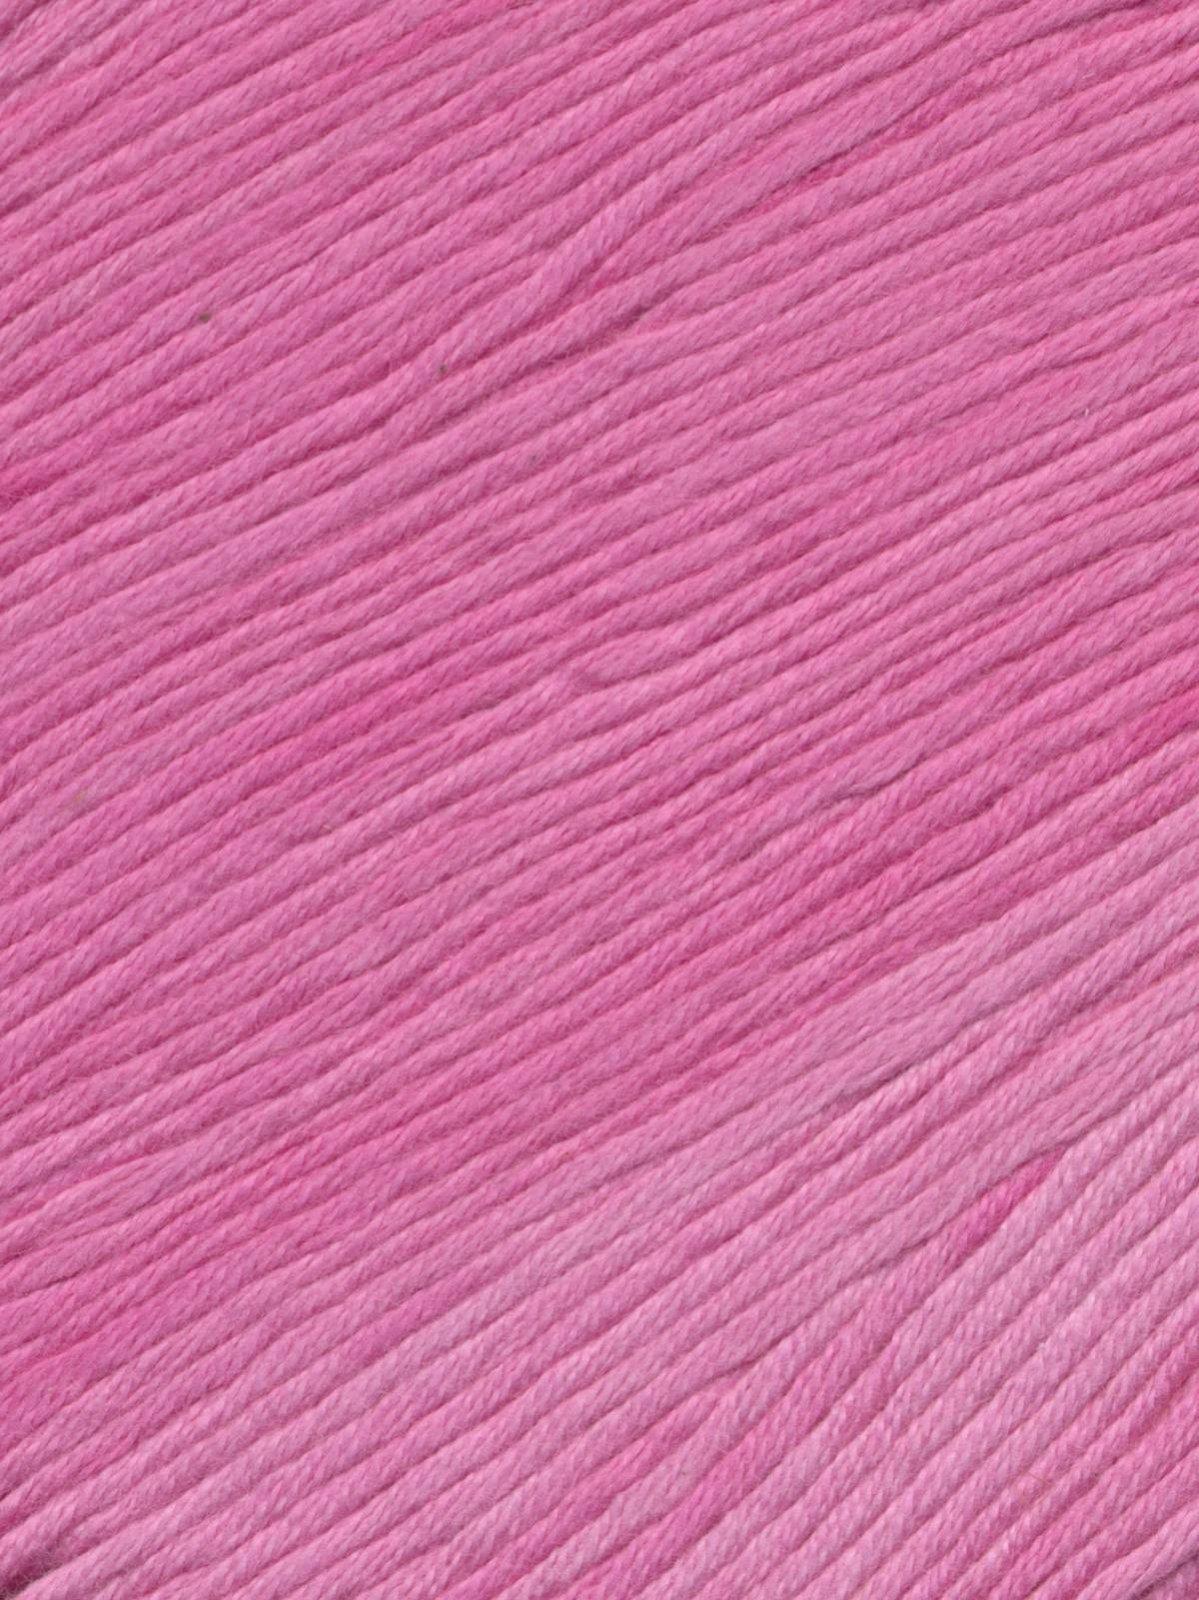 Ella Rae Sunkissed - Flamingo Island Col 2